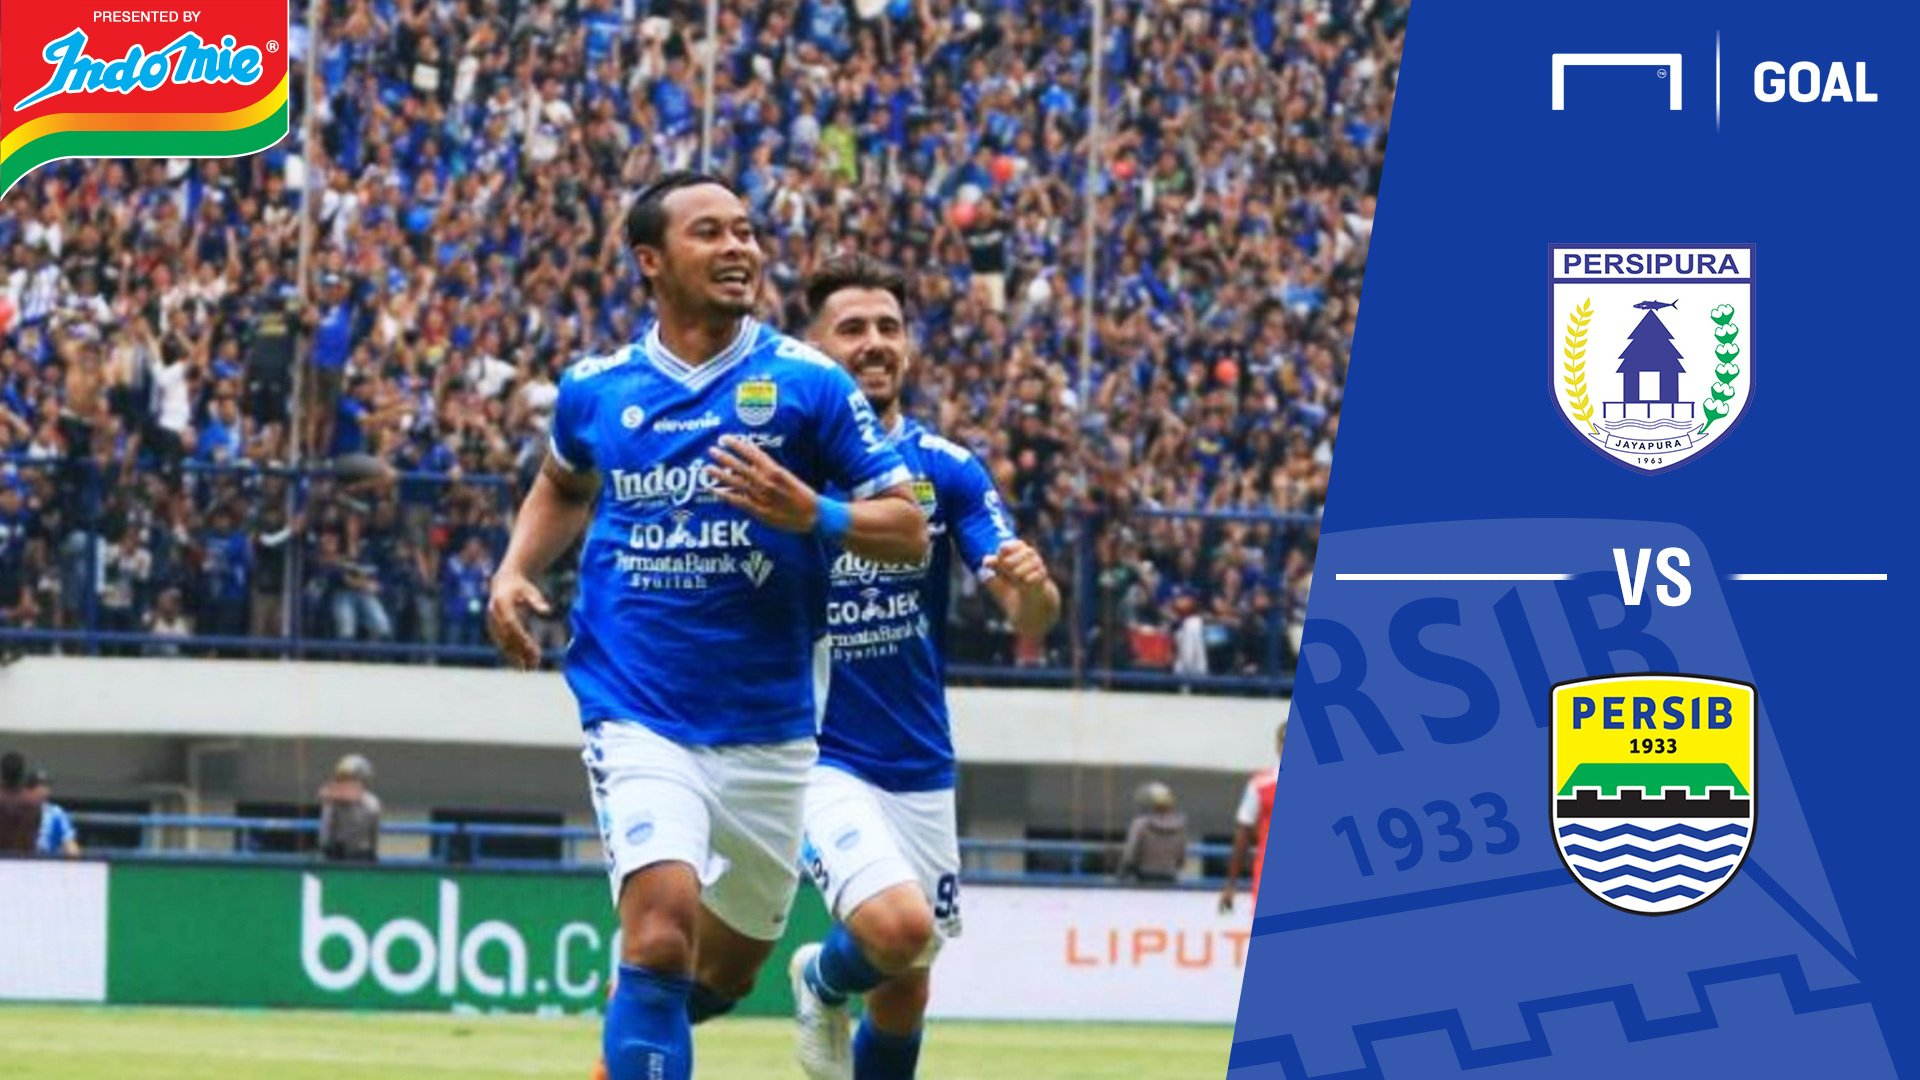 PREVIEW Liga 1 2018: Persipura Jayapura - Persib Bandung https://t.co/y9Bkbb4BYK  #SatukanTekadJuang  @Indomielovers https://t.co/fh5KsnUHM4